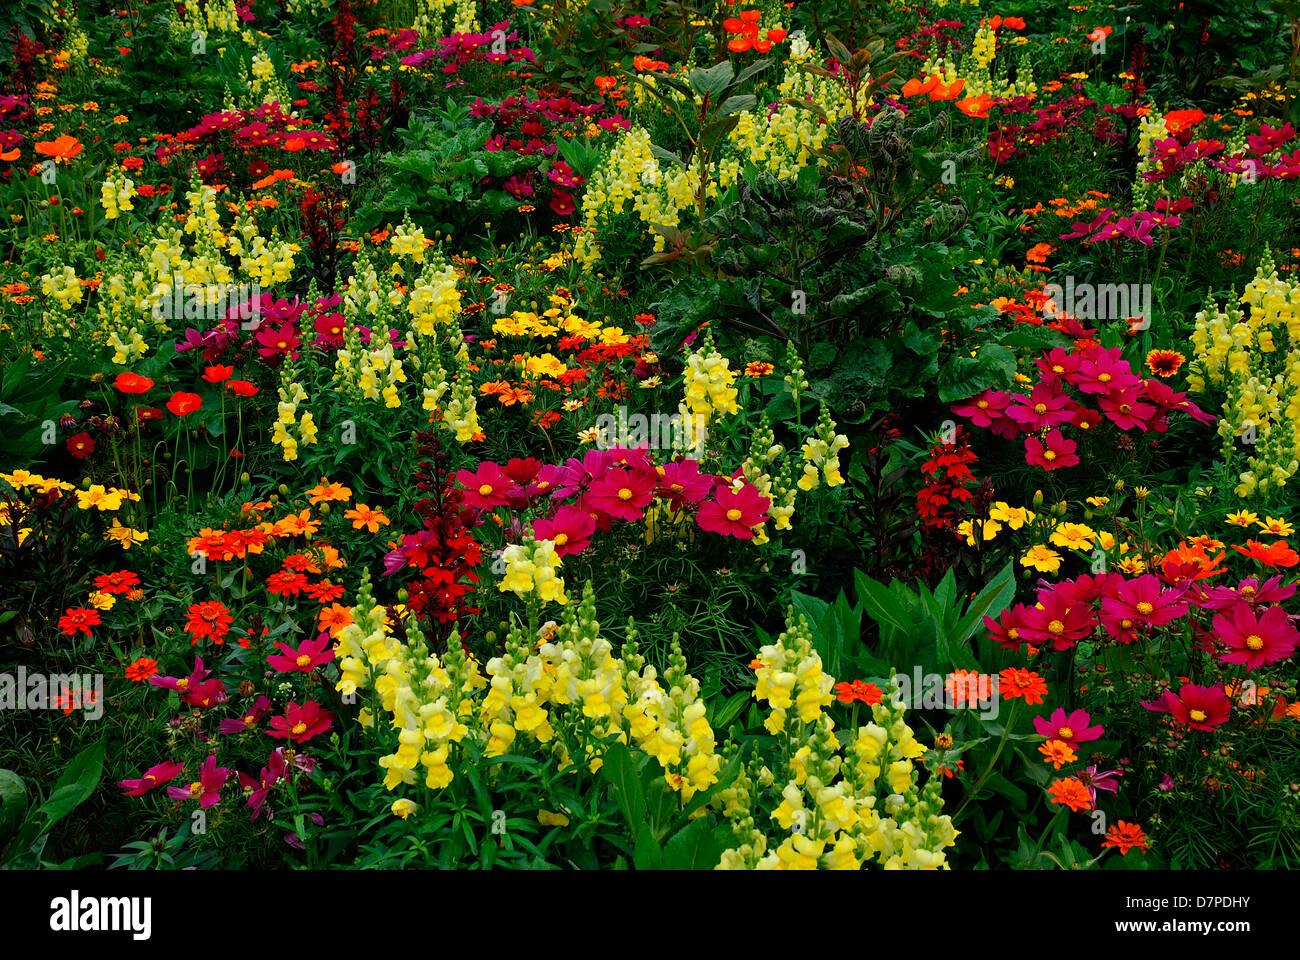 bunter blumengarten mit verschiedenen blumen gemischte arten blumengarten buntgemischt mit. Black Bedroom Furniture Sets. Home Design Ideas